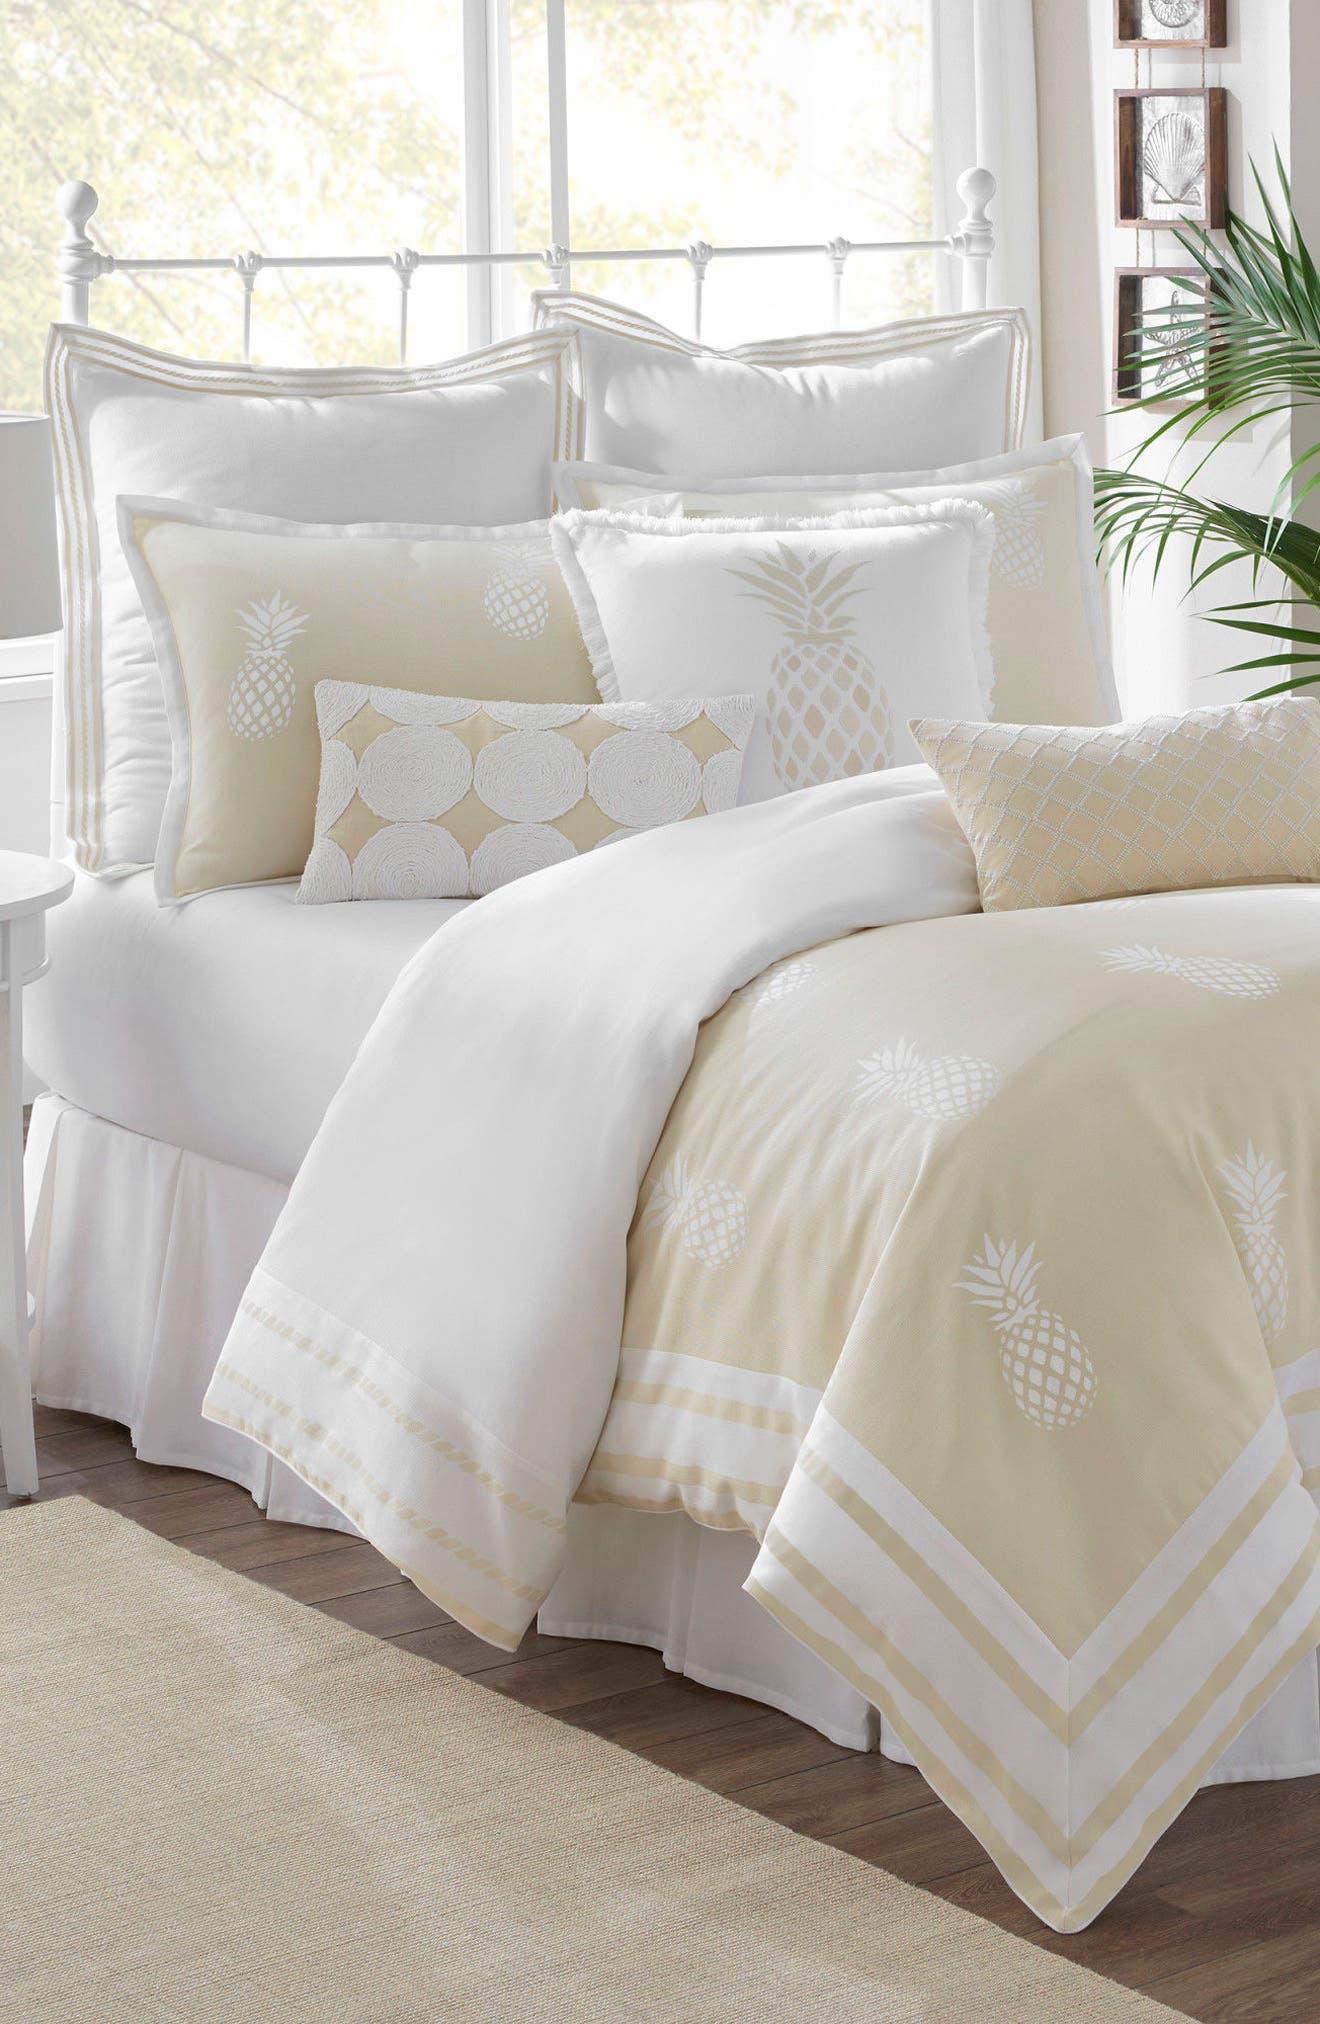 Alternate Image 2  - Southern Tide Southern Hospitality Comforter, Sham & Bed Skirt Set